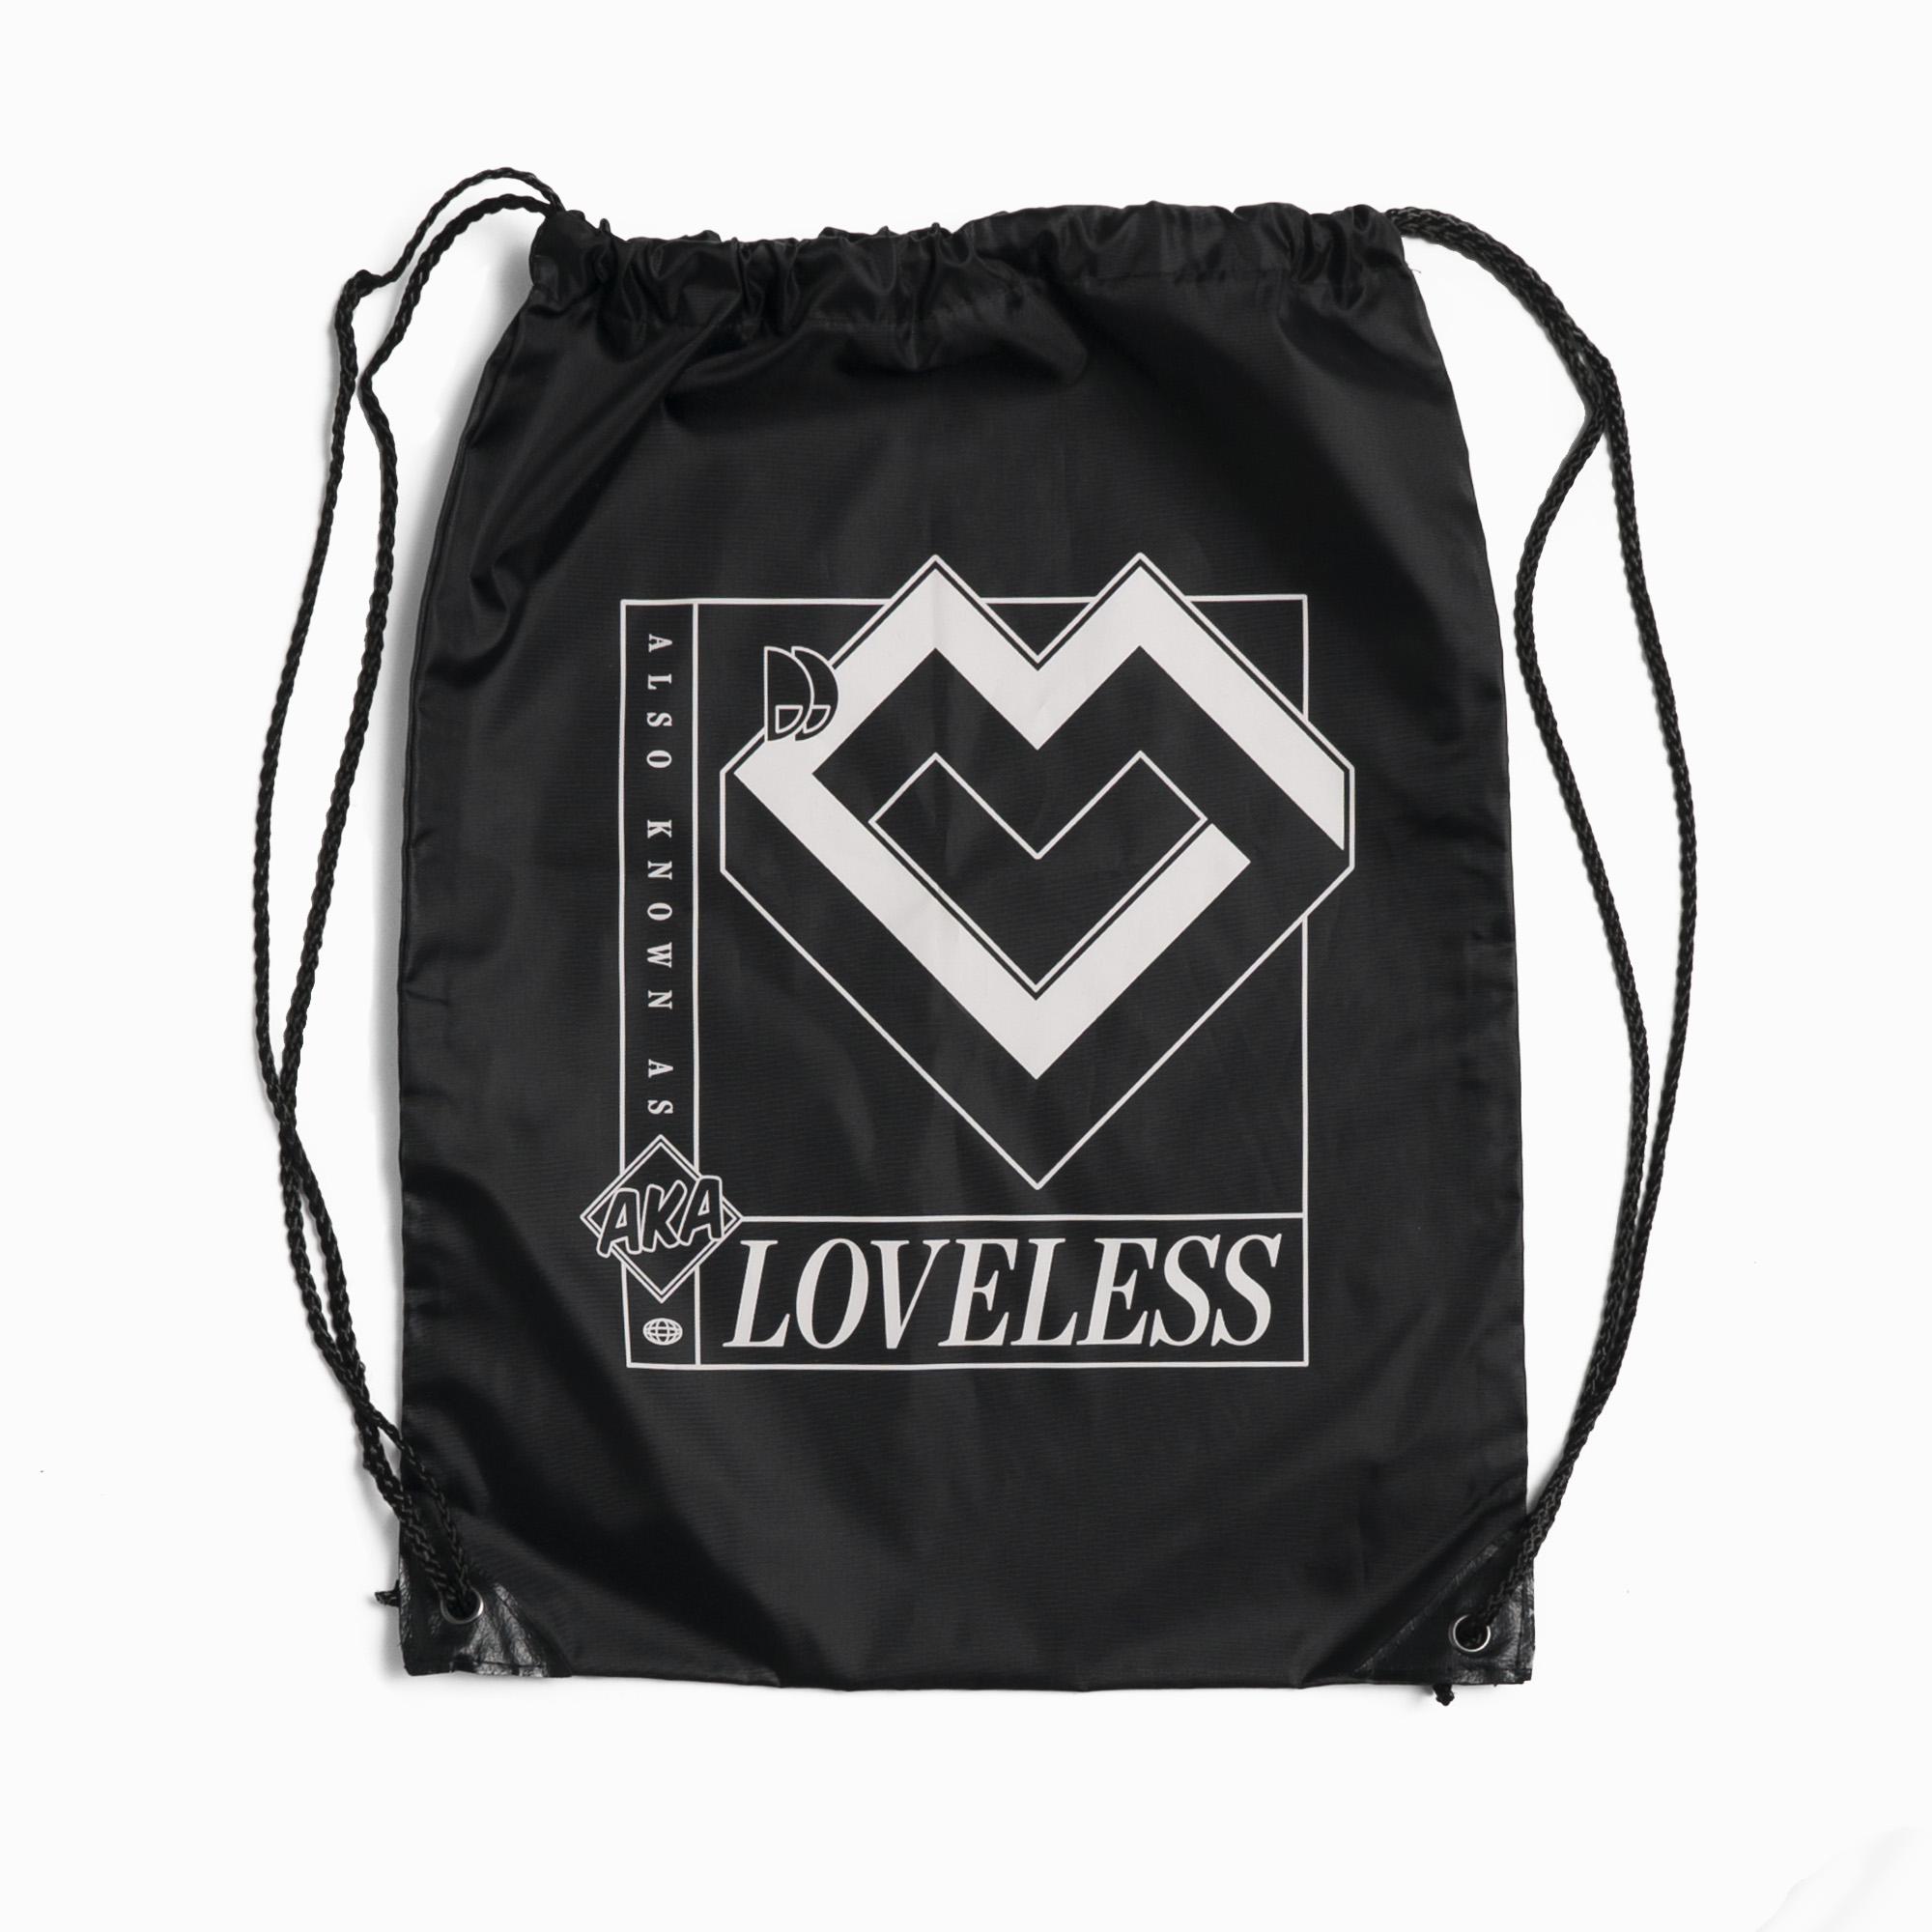 http://www.alsoknownas.no/loveless/